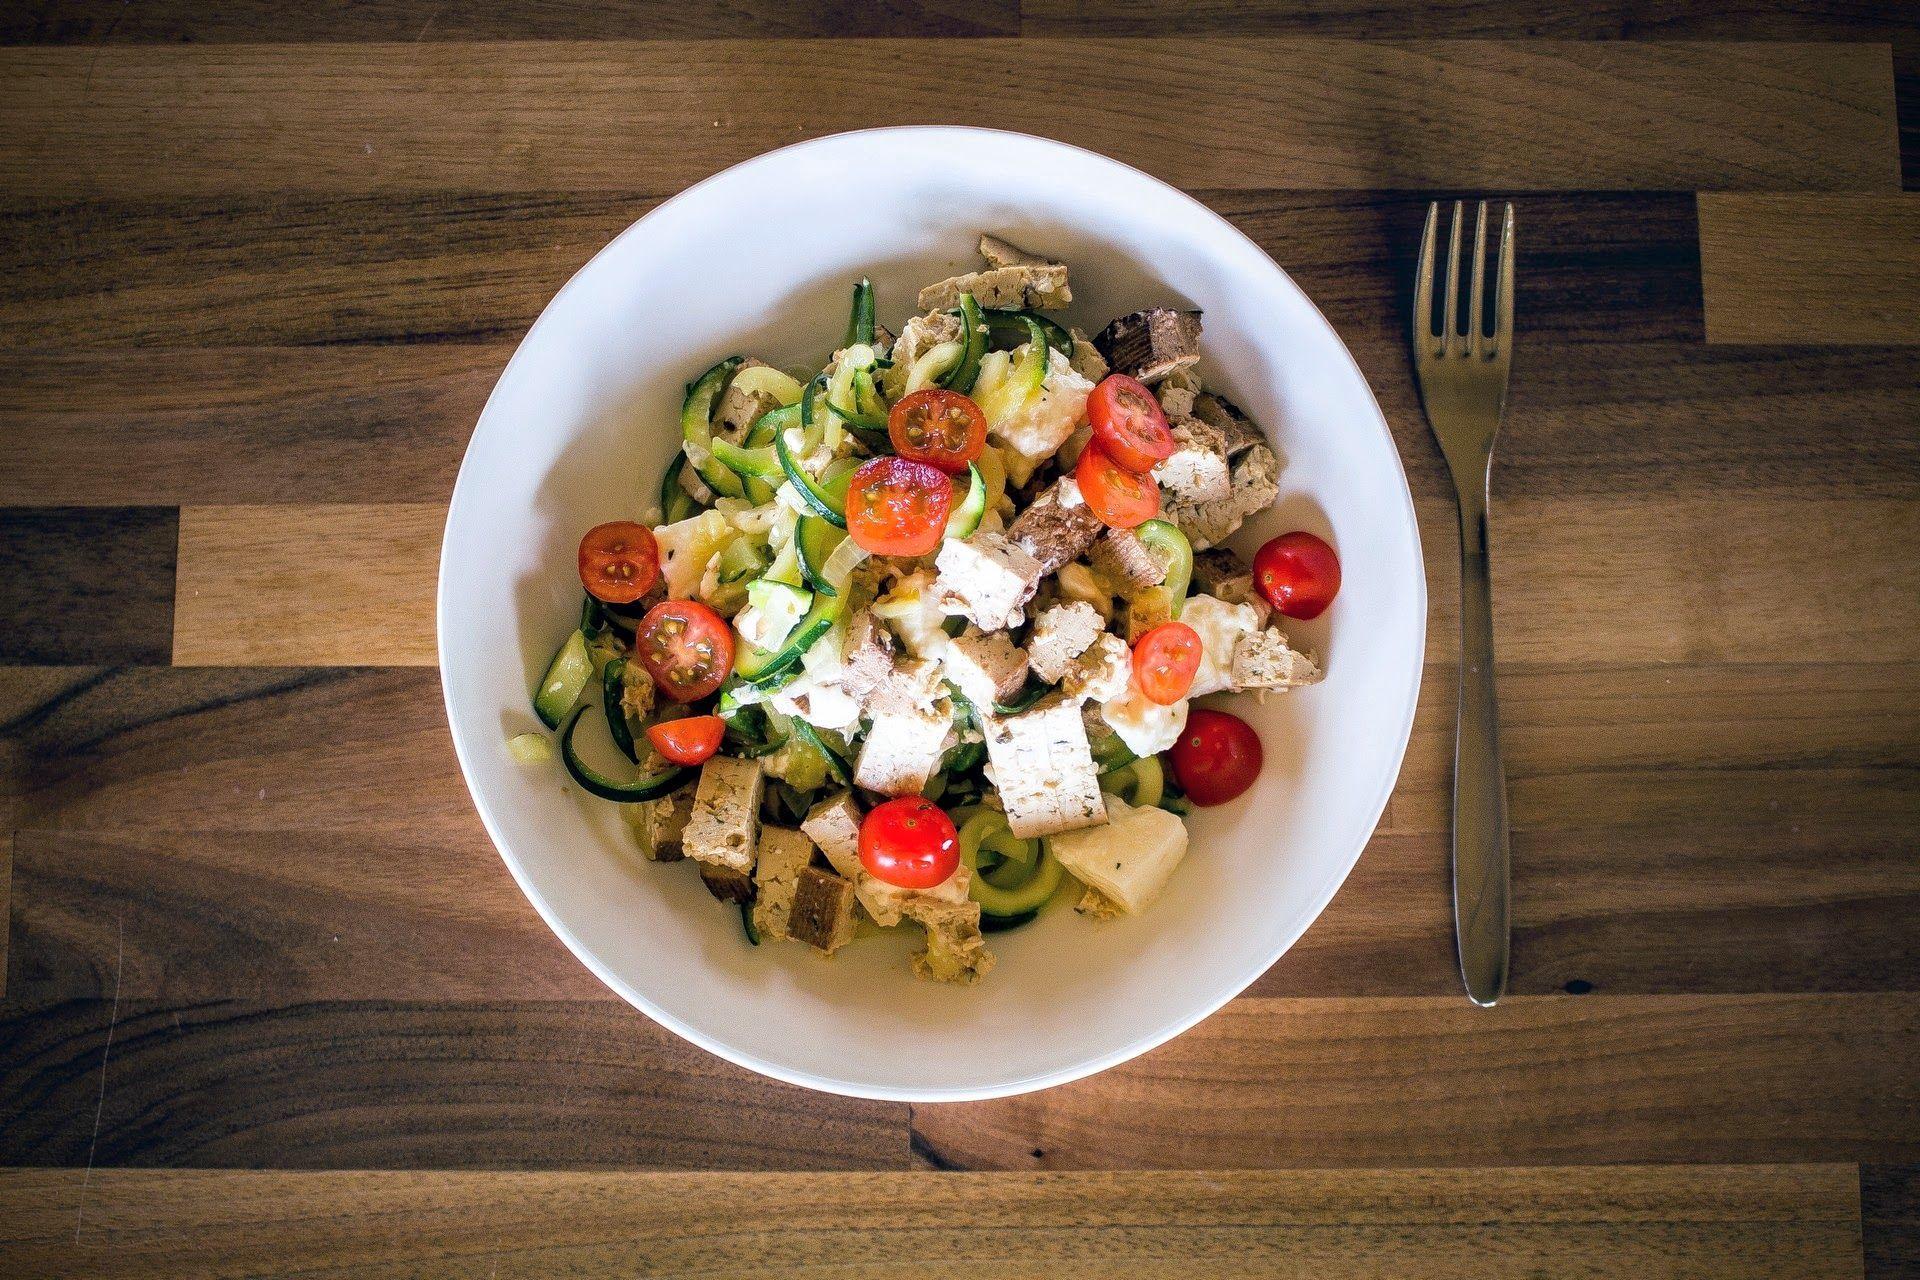 Low Carb Ideen - Zucchinispaghetti mit Räuchertofu, Feta und Datteltomaten - photography - food Ⓒ PASTELPIX